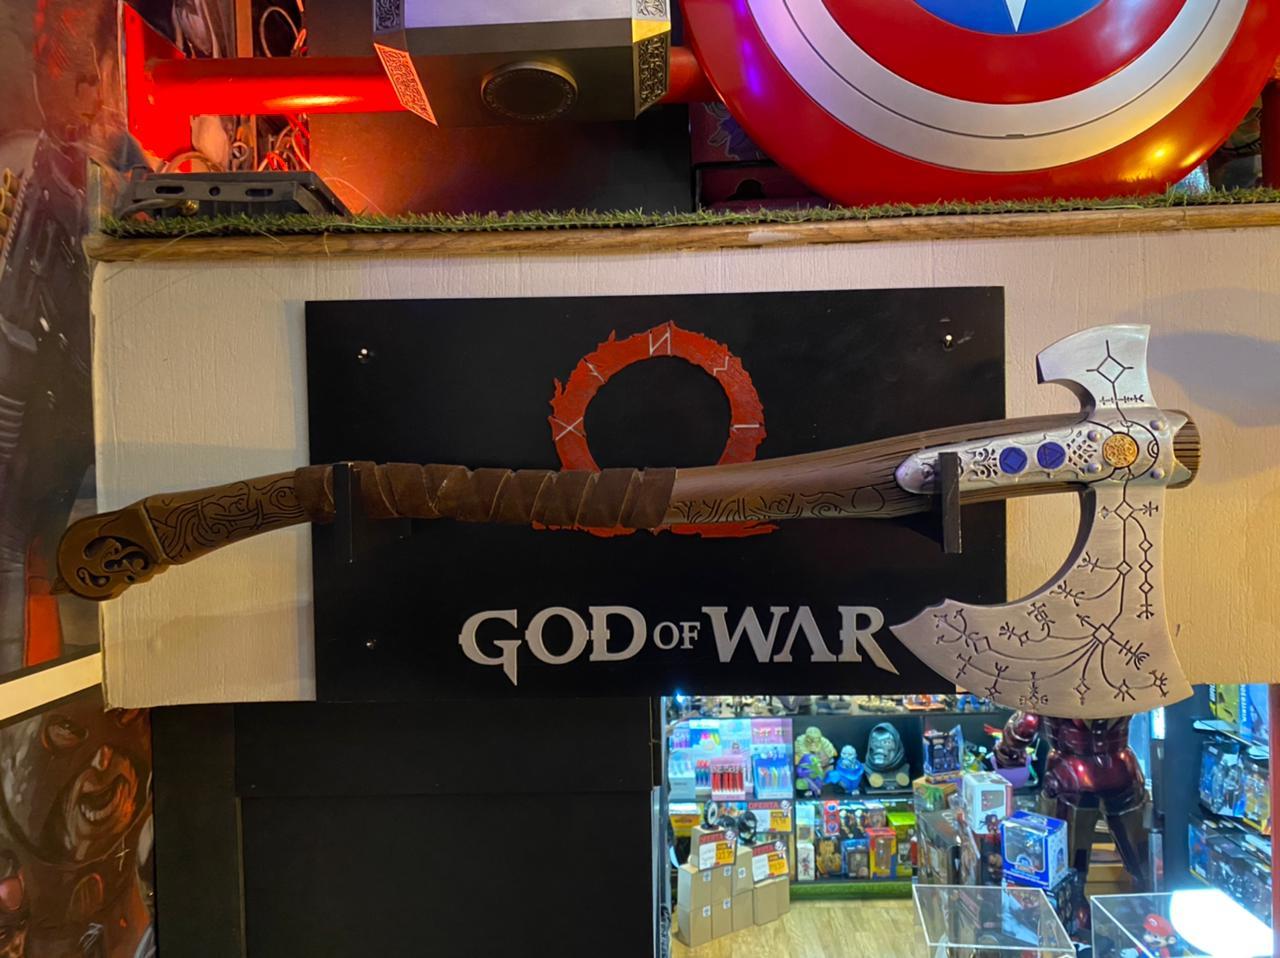 Réplica Machado Leviatã Kratos: God of War (2018) 1/1 - Fanatic Studios